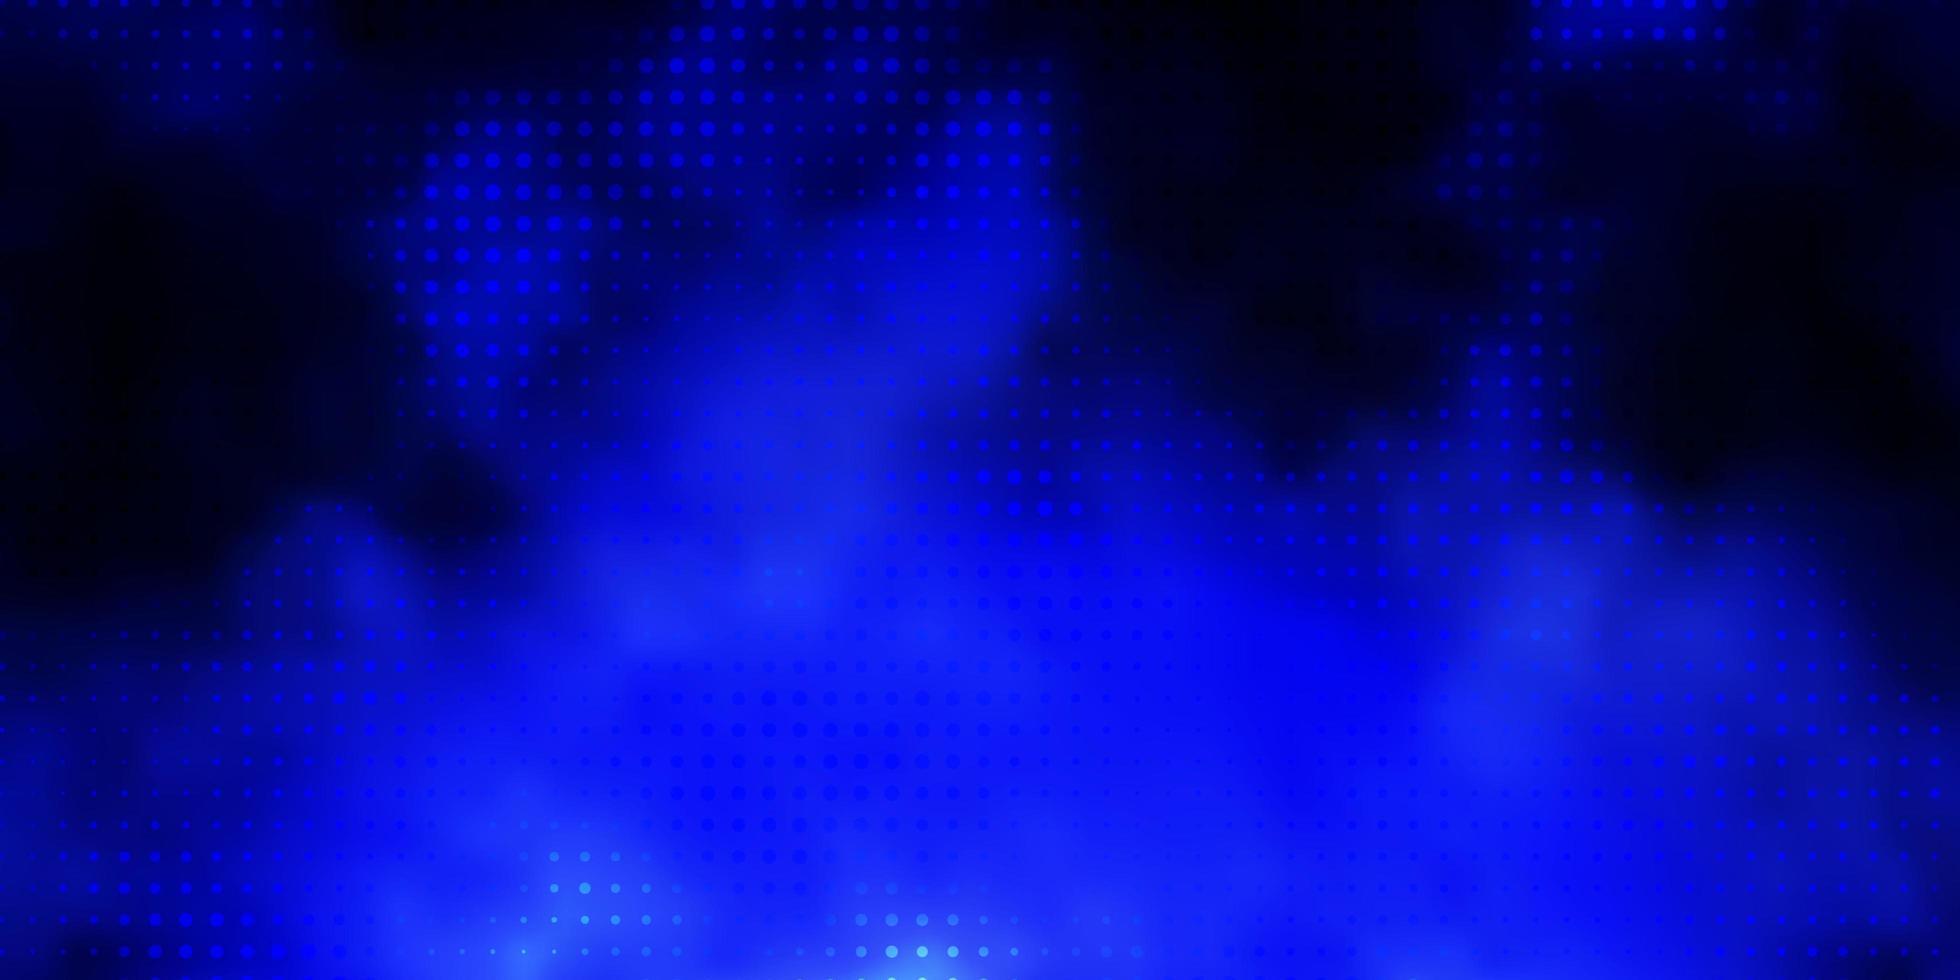 dunkelblaues Vektorlayout mit Kreisformen vektor